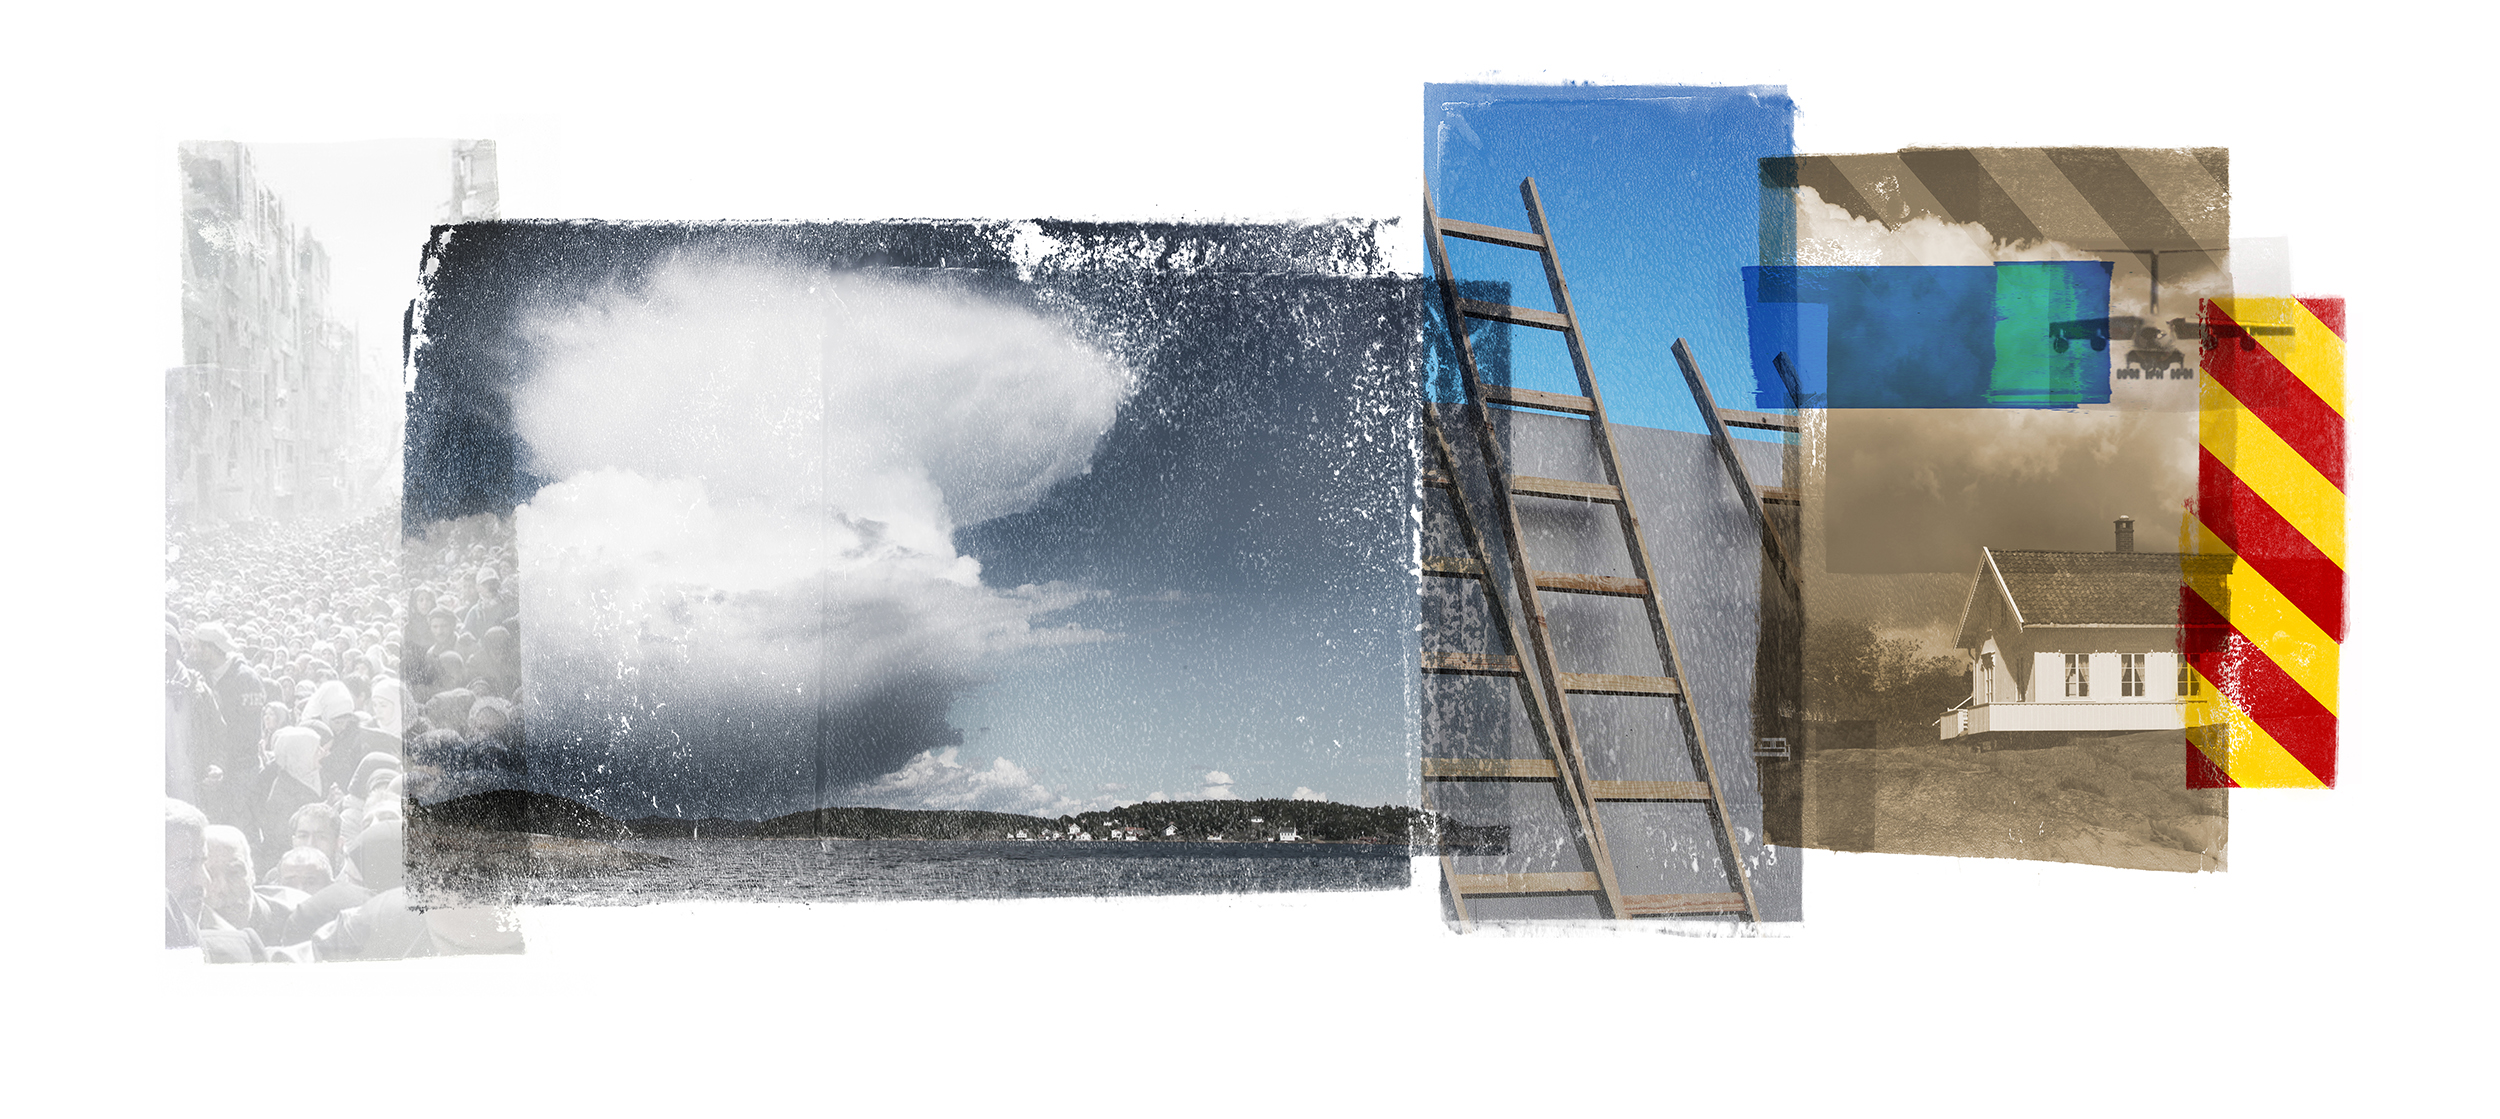 Cumulus II. ( Yarmouk / Sagesund ) Archipelago  Original pigment print / BFK rives 250 gr 56 x 25 cm / 22 x 9,8 in Edition of 50 + 7 Ap Editeur: Per Fronth Studios / Henrik Aunevik  04/2014: